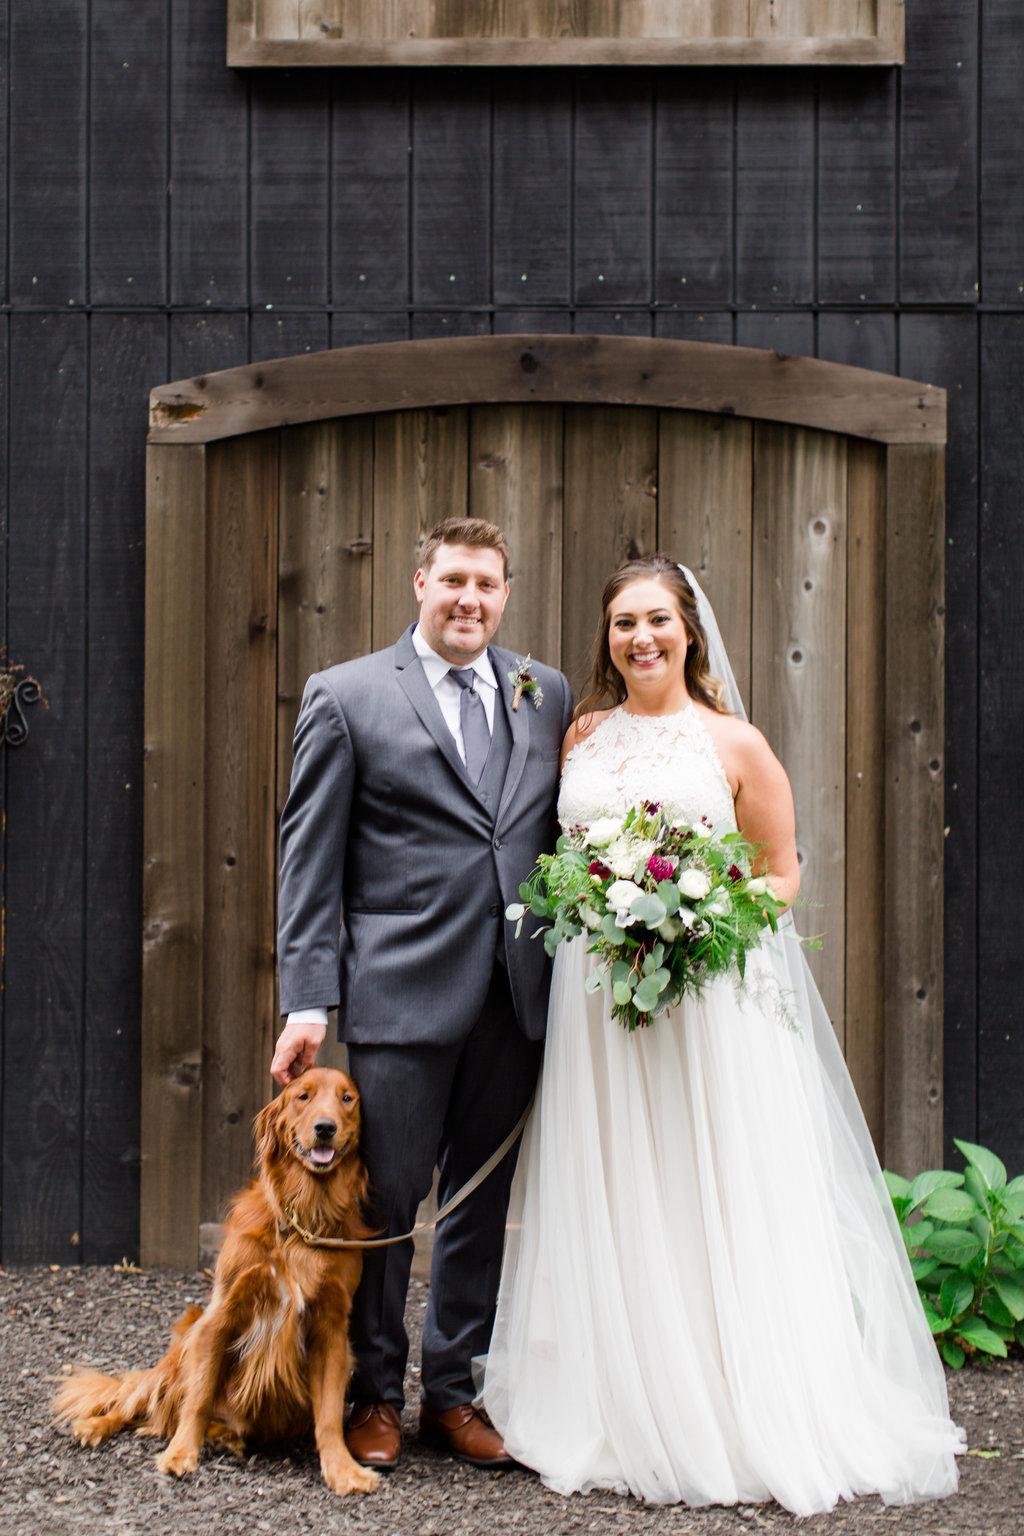 The Barn at Kennedy Farm Wedding - Lizton, Indiana Wedding Venue - Danielle Harris Photography -- Wedding Blog - The Overwhelmed Bride